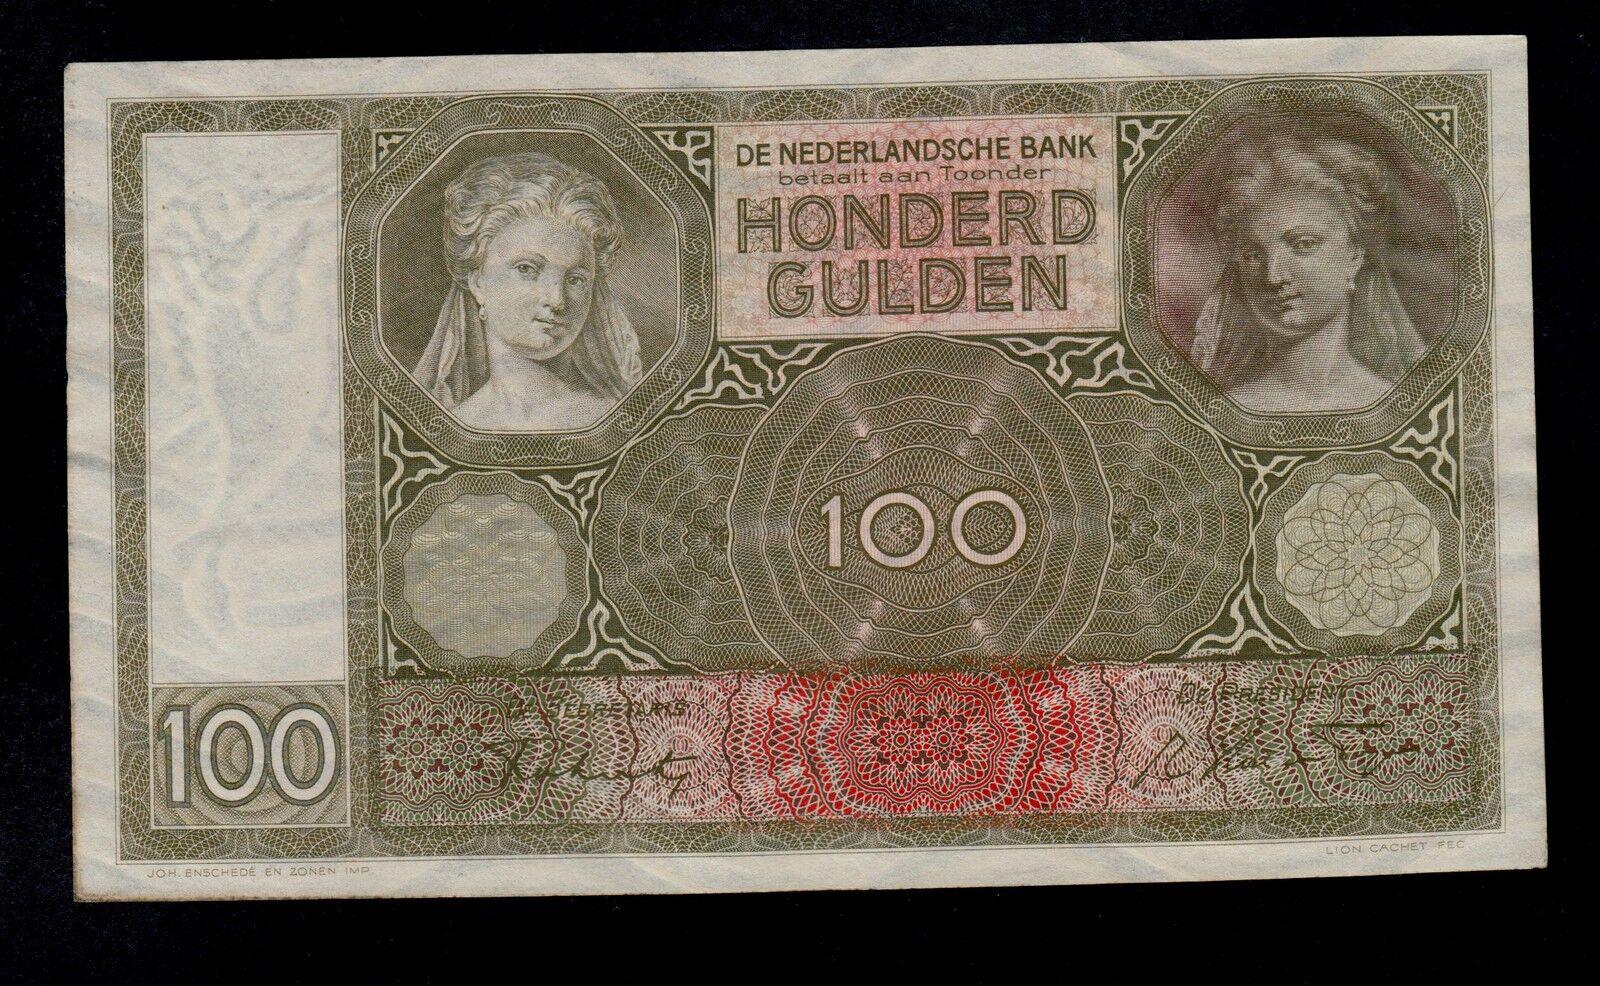 RECTO 100 gulden Type 1930 luitspelende vrouw - None